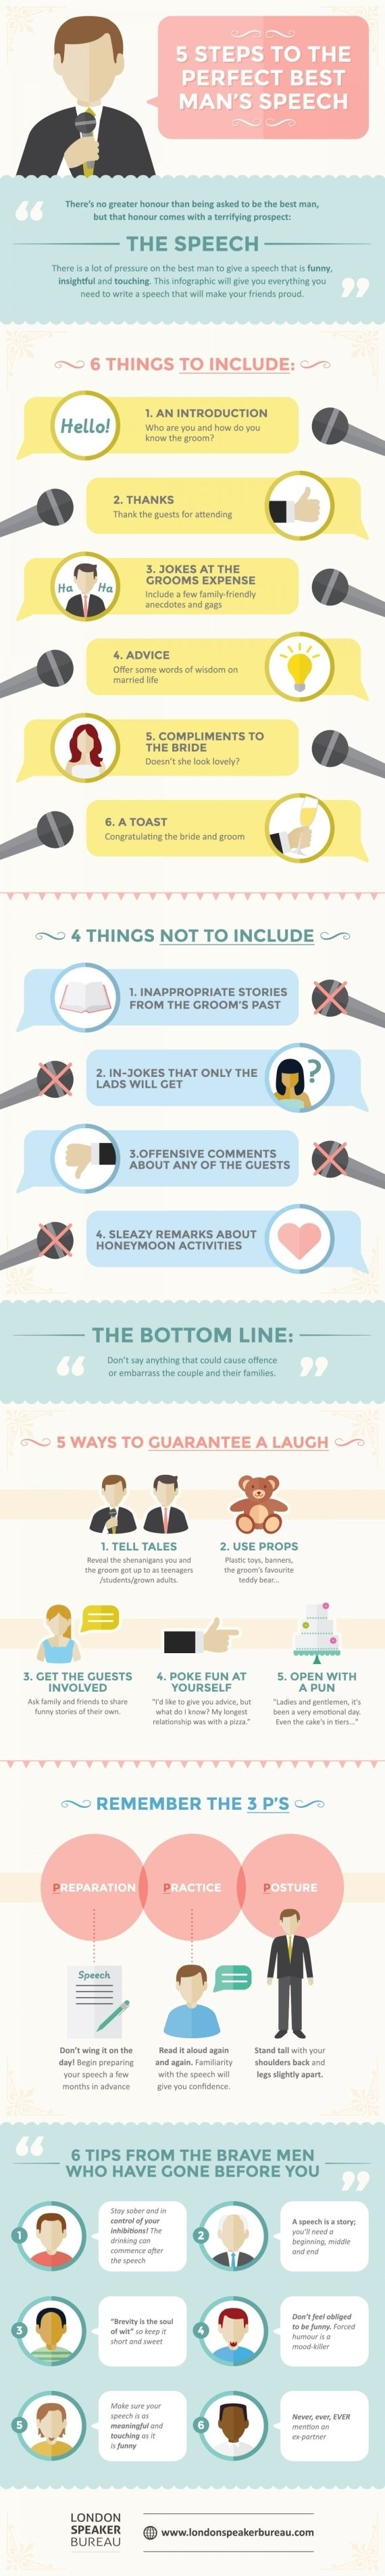 How to write a speech for a wedding